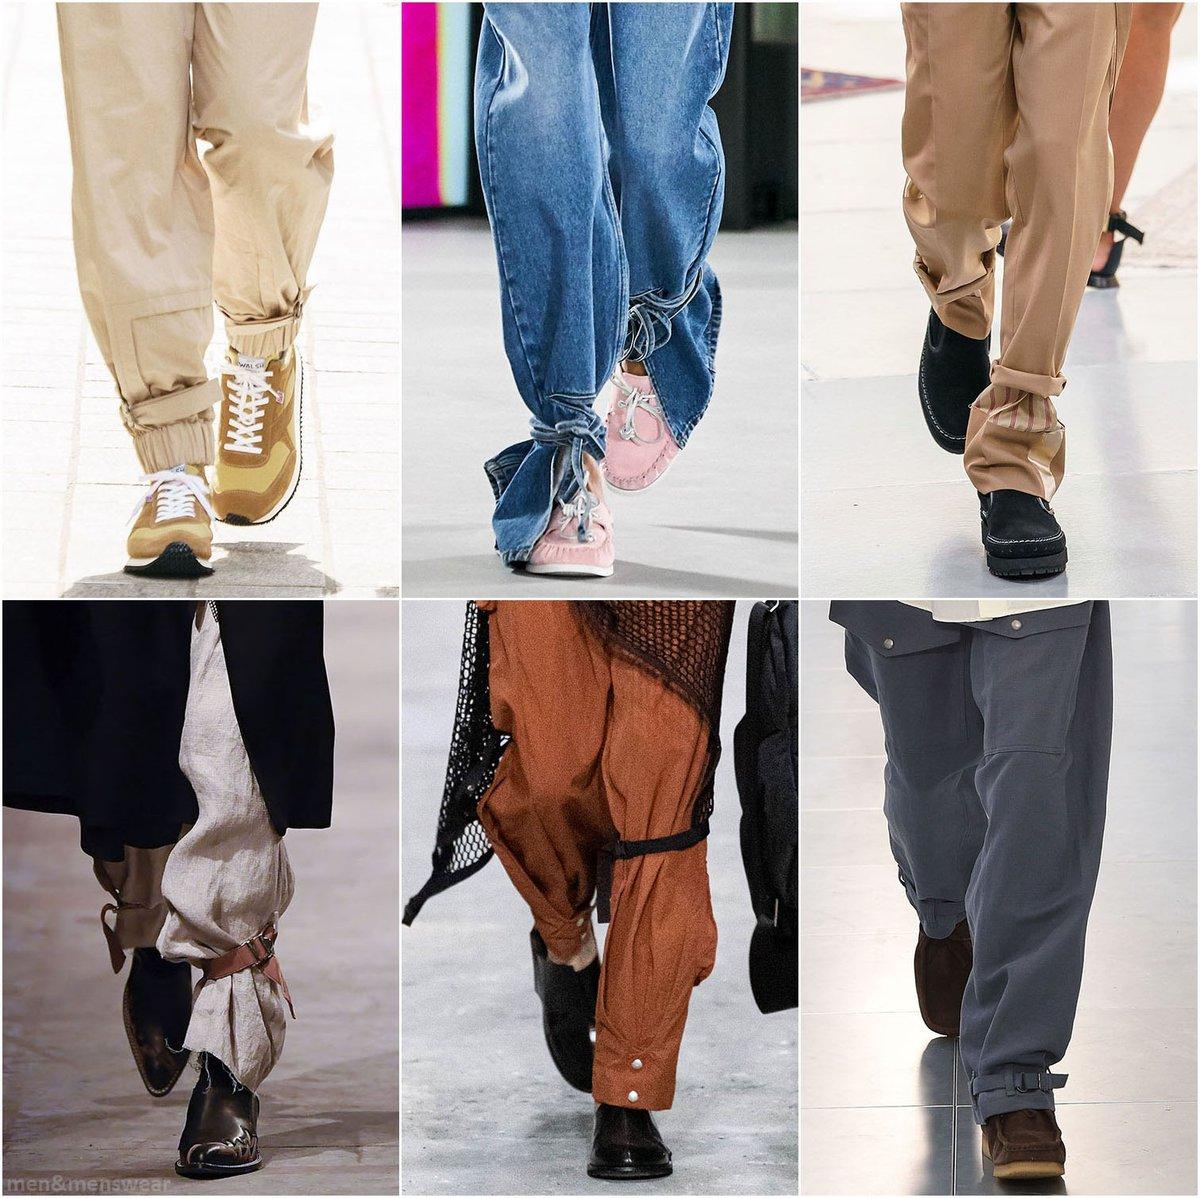 #chalayan #loewe #sacai #bedjwford #acoldwall #kentandcurwen #fashion #style #menswear #mensfashion #menstyle #springfashion #summerfashion #runway #fashionshow #pants #trousers #trendpic.twitter.com/R6pdtfbT3N